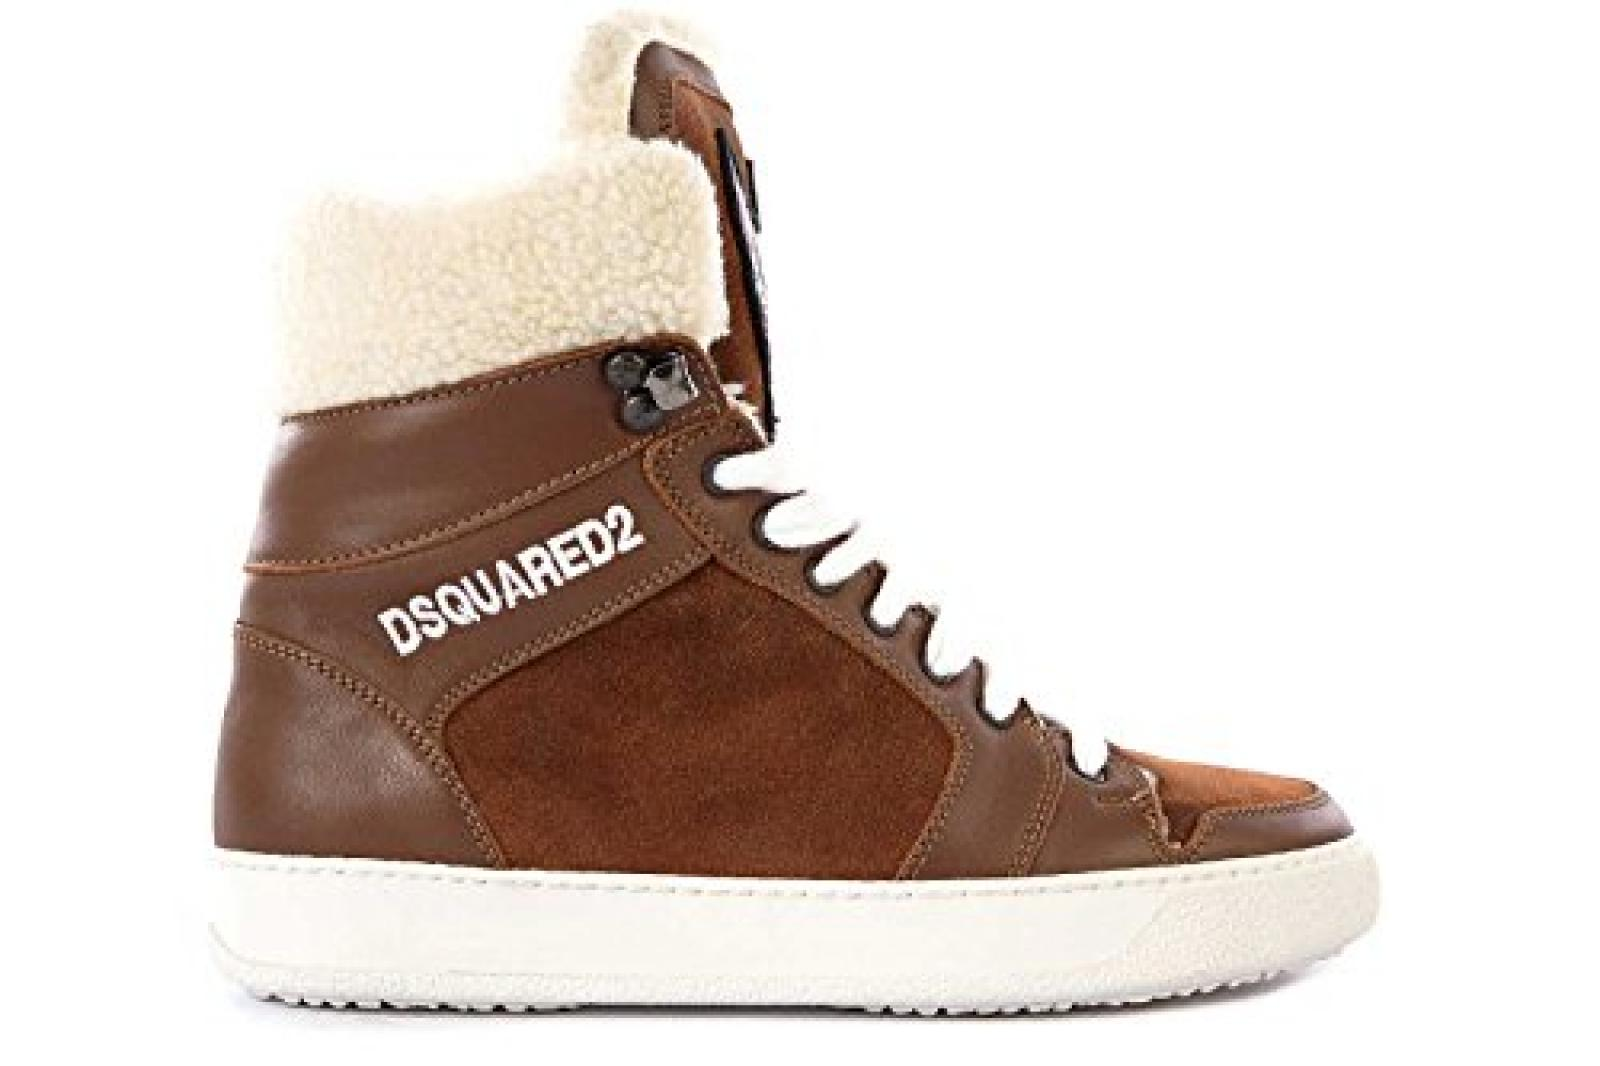 Dsquared2 Dsquared Herrenschuhe Herren Leder Schuhe High Sneakers Braun